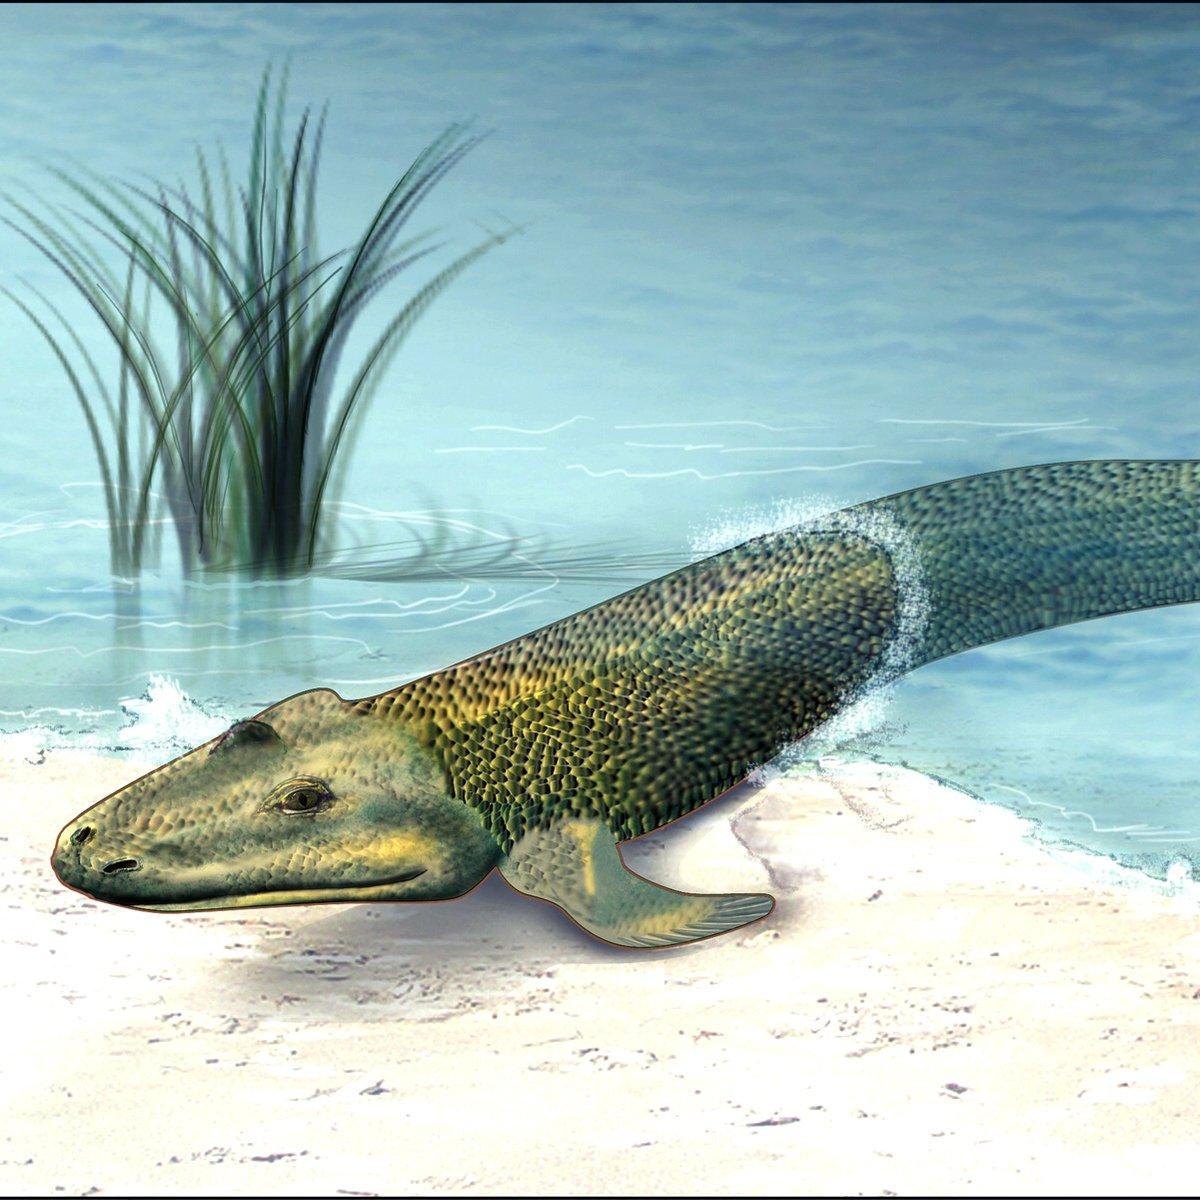 375 million years ago we were a walking fish.